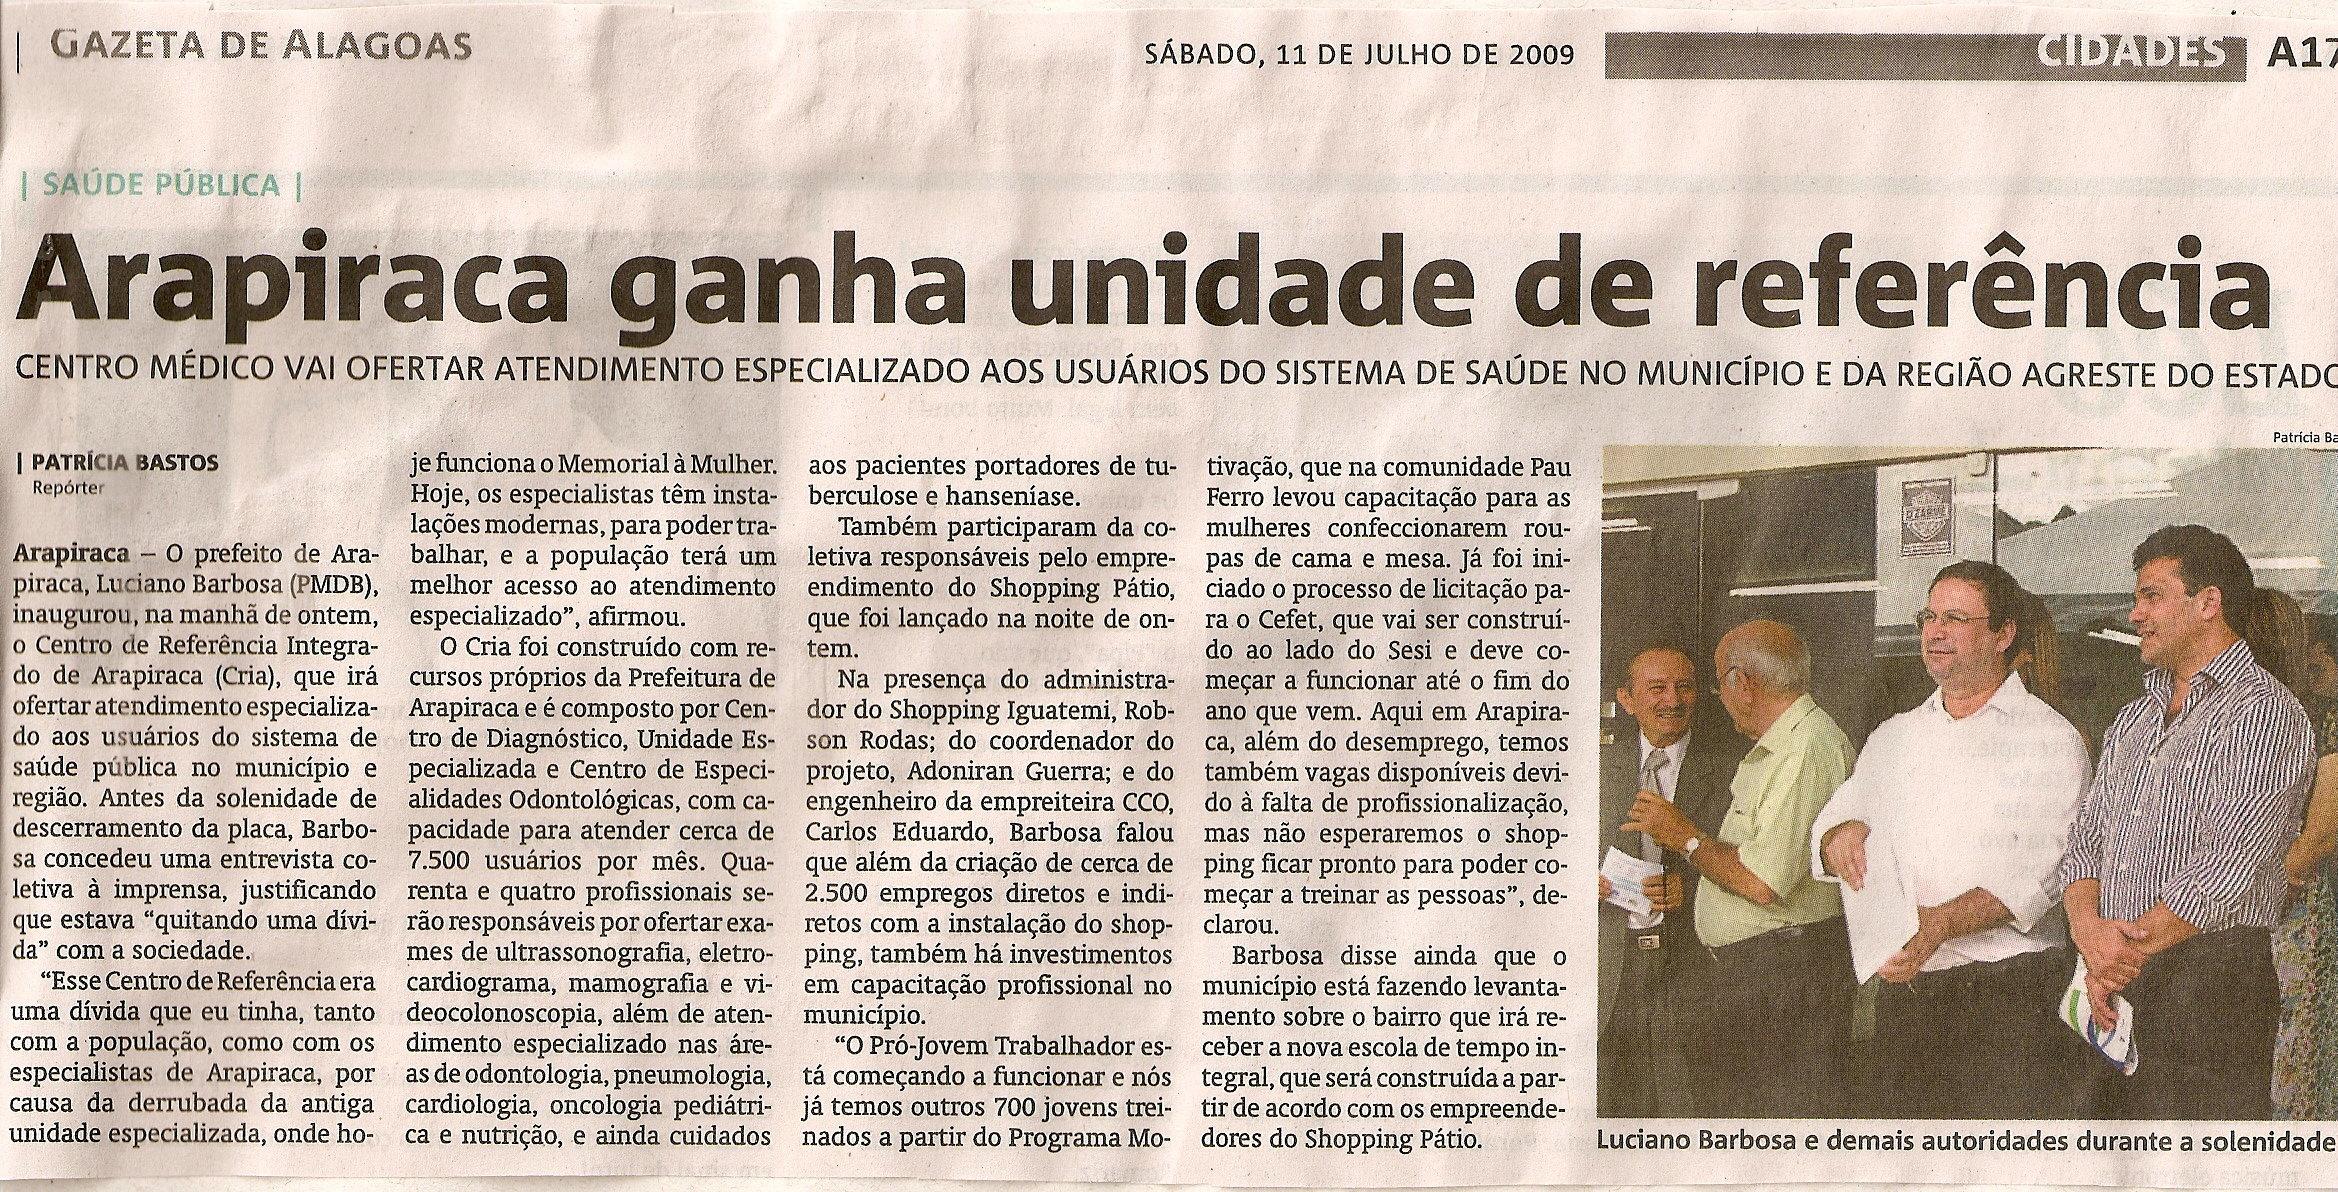 gazeta_11_07_2009 - Cópia